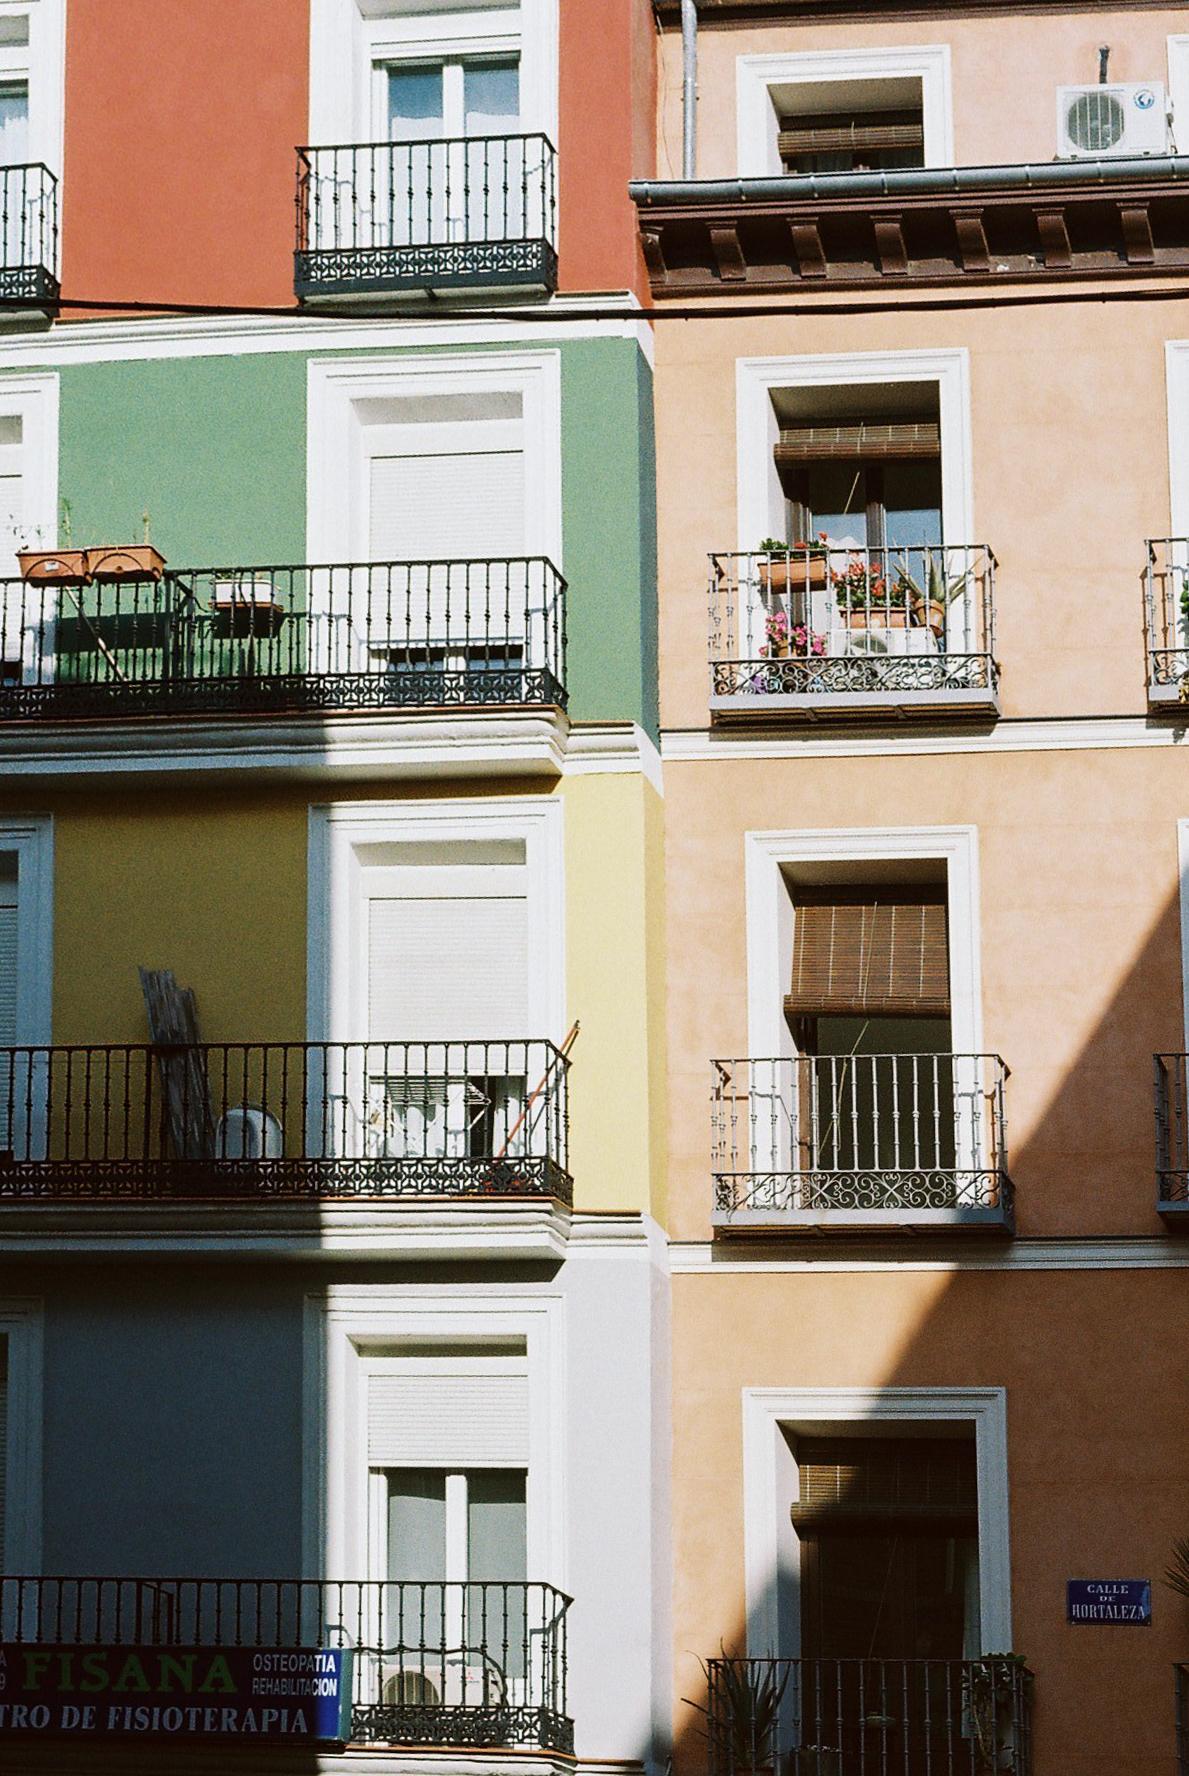 Copy of Chueca, Madrid (35mm)